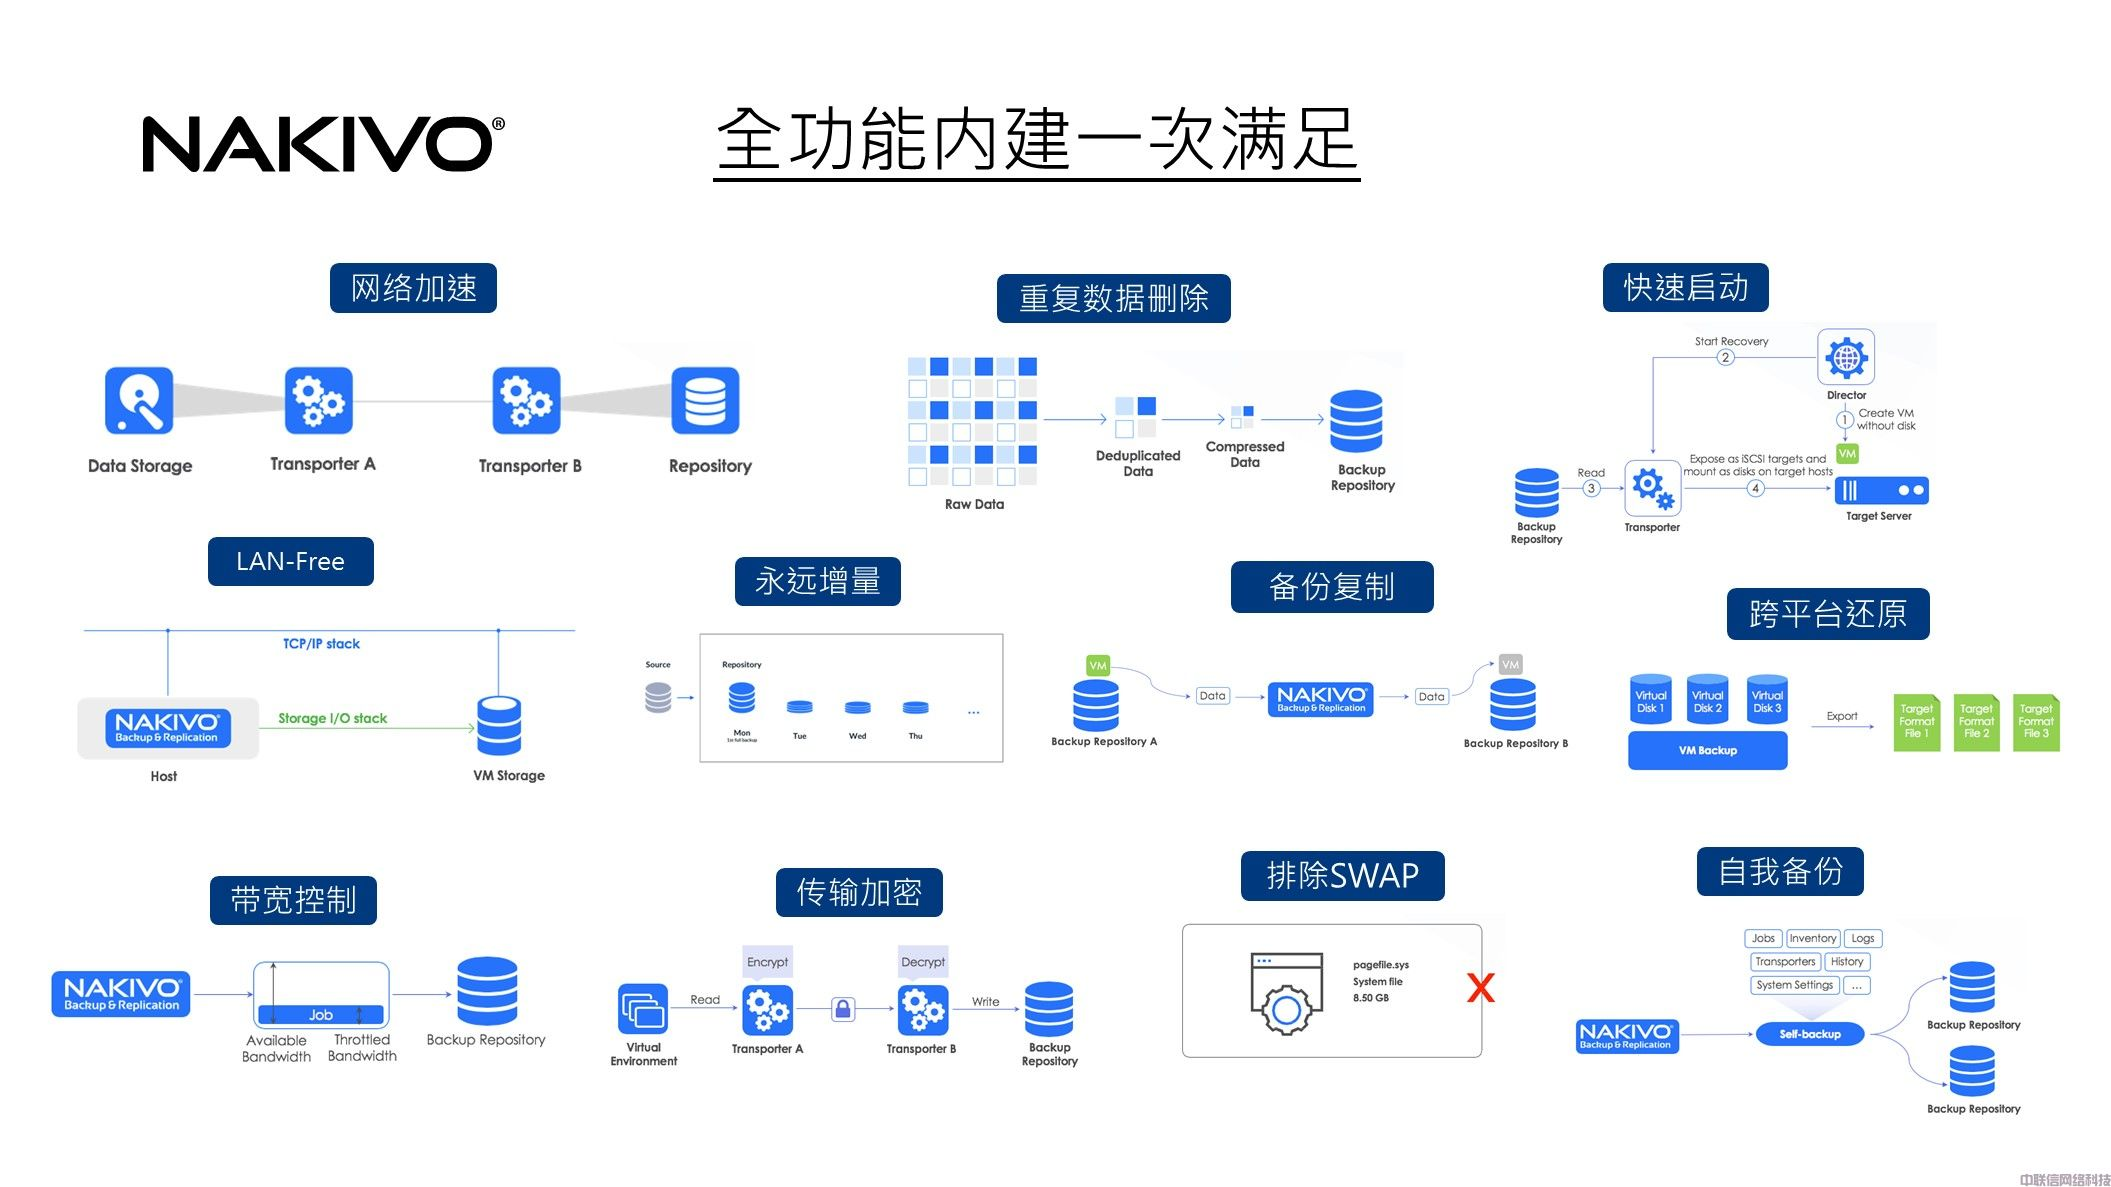 虚拟化备份方案NAKIVO Backup & Replication(图27)